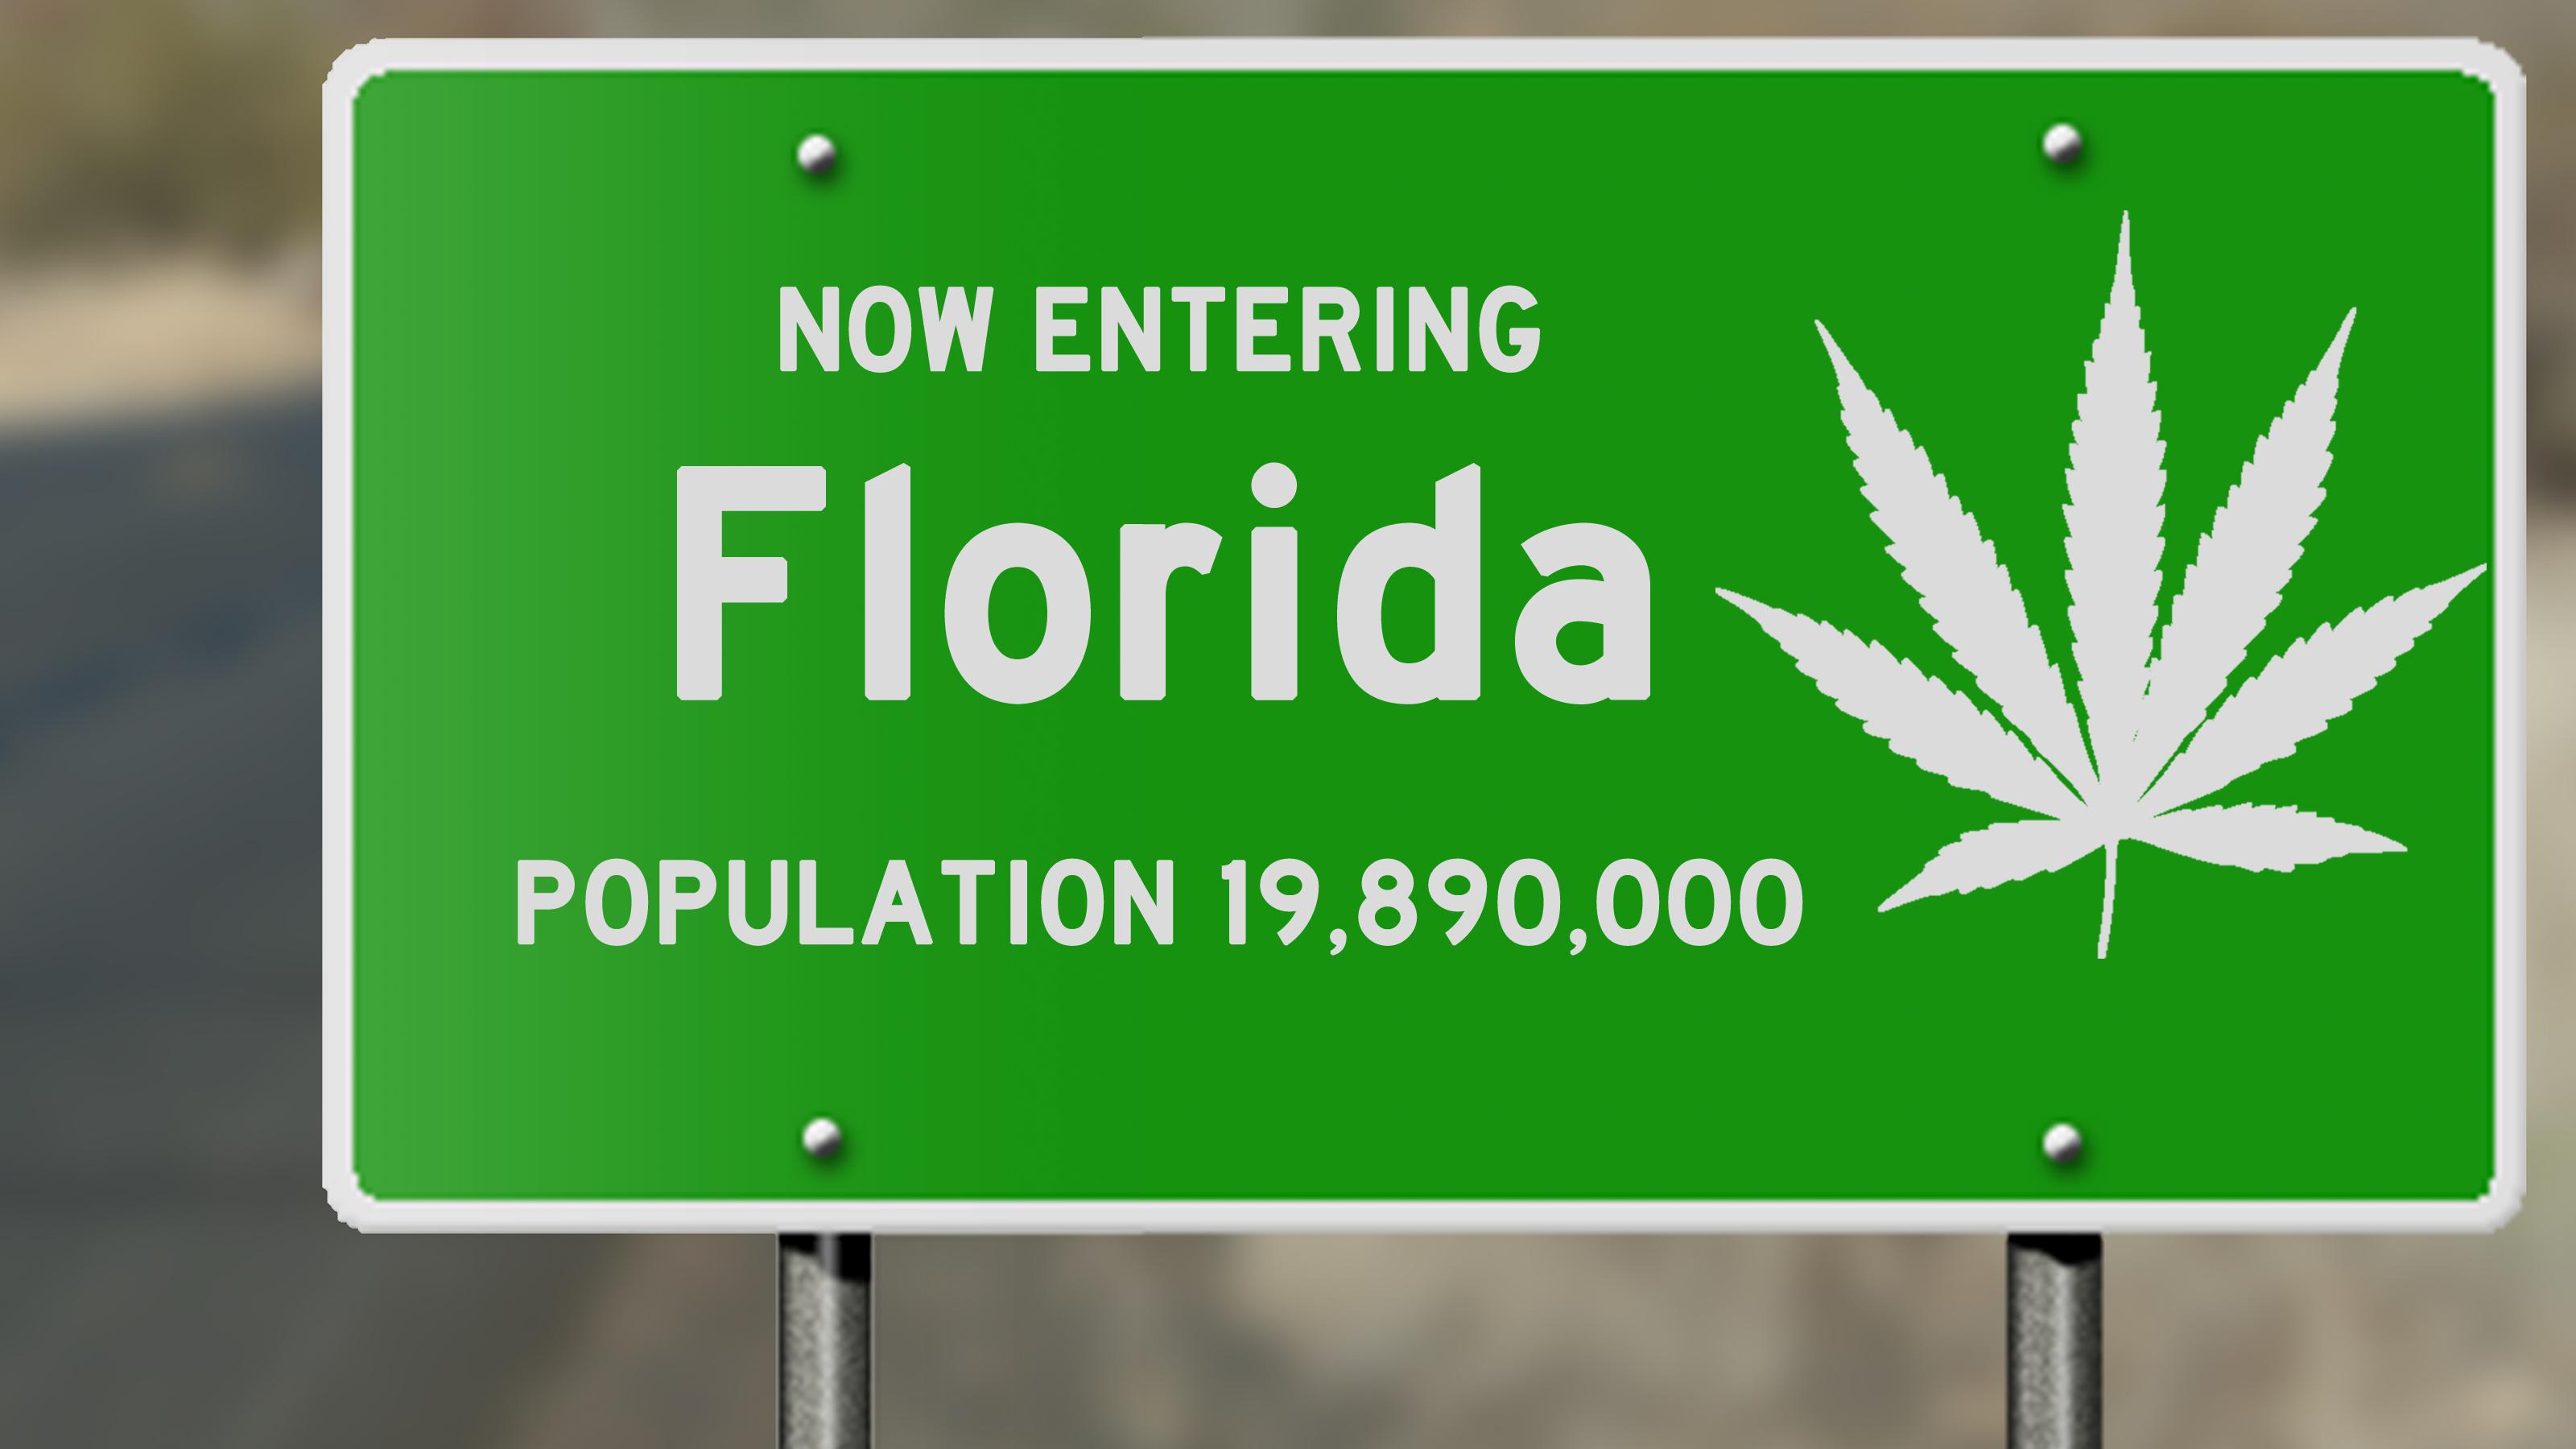 Entering Florida sign with a marijuana leaf on it